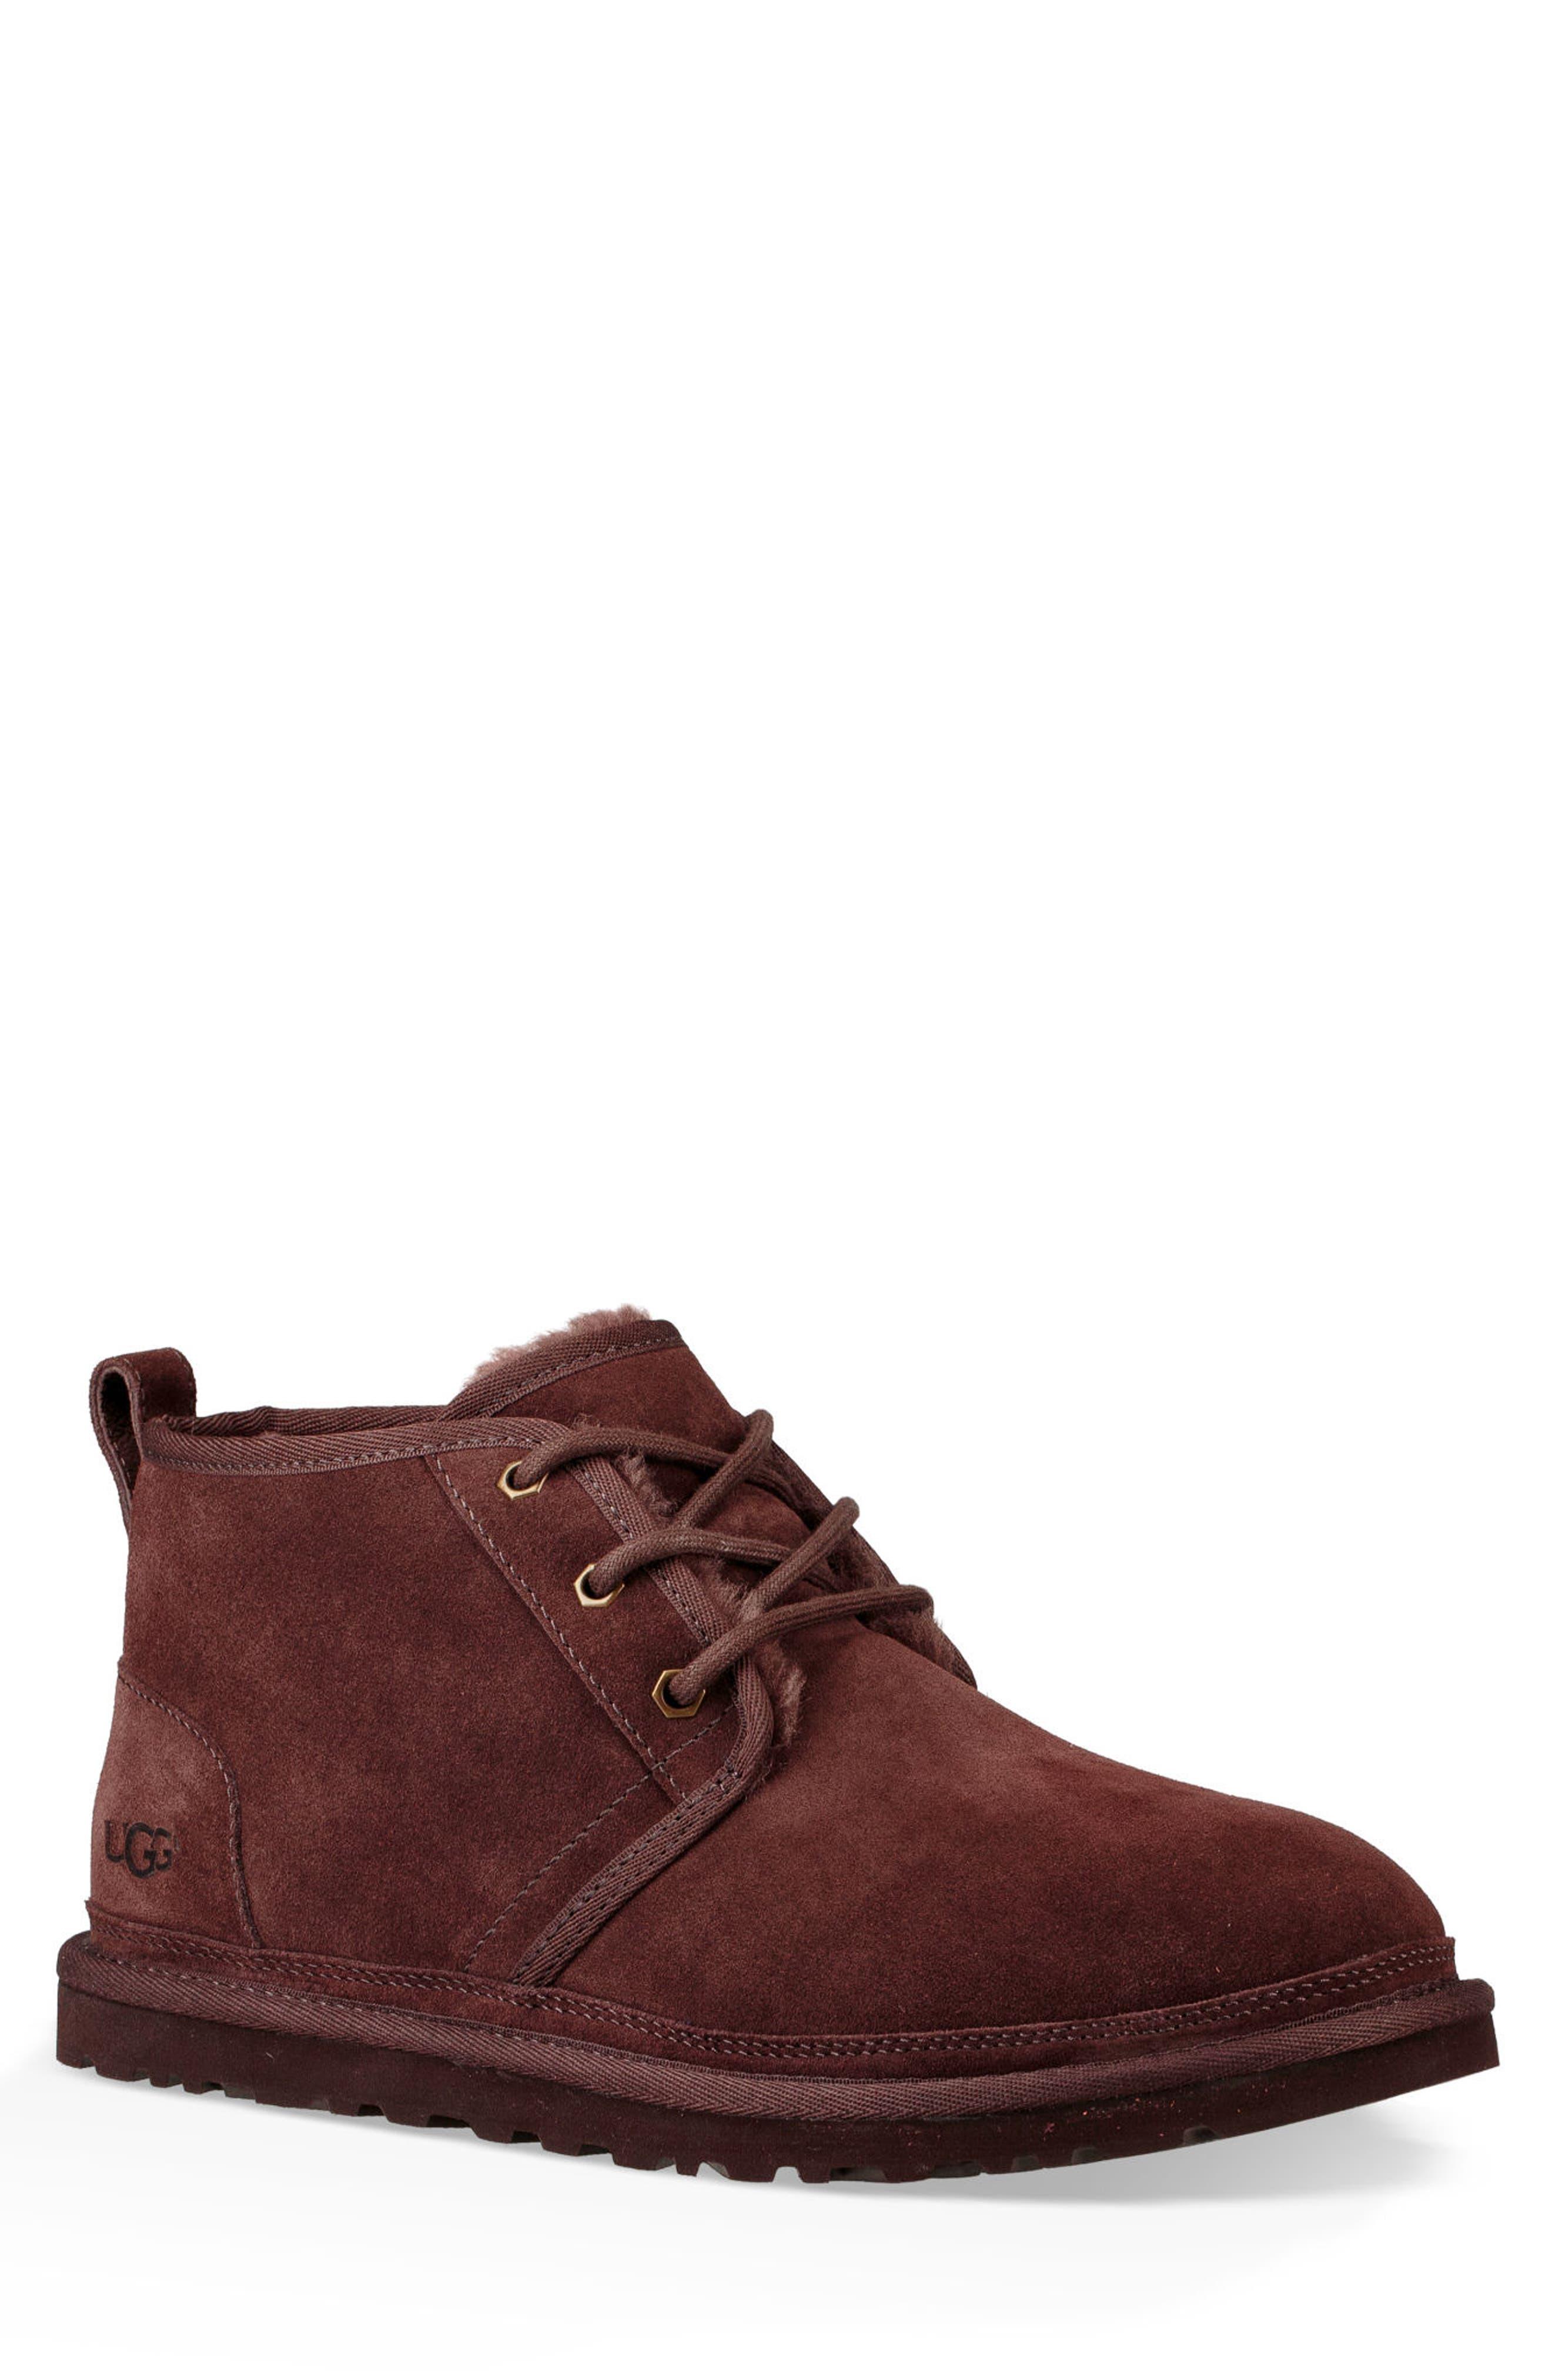 Ugg Neumel Chukka Boot, Brown